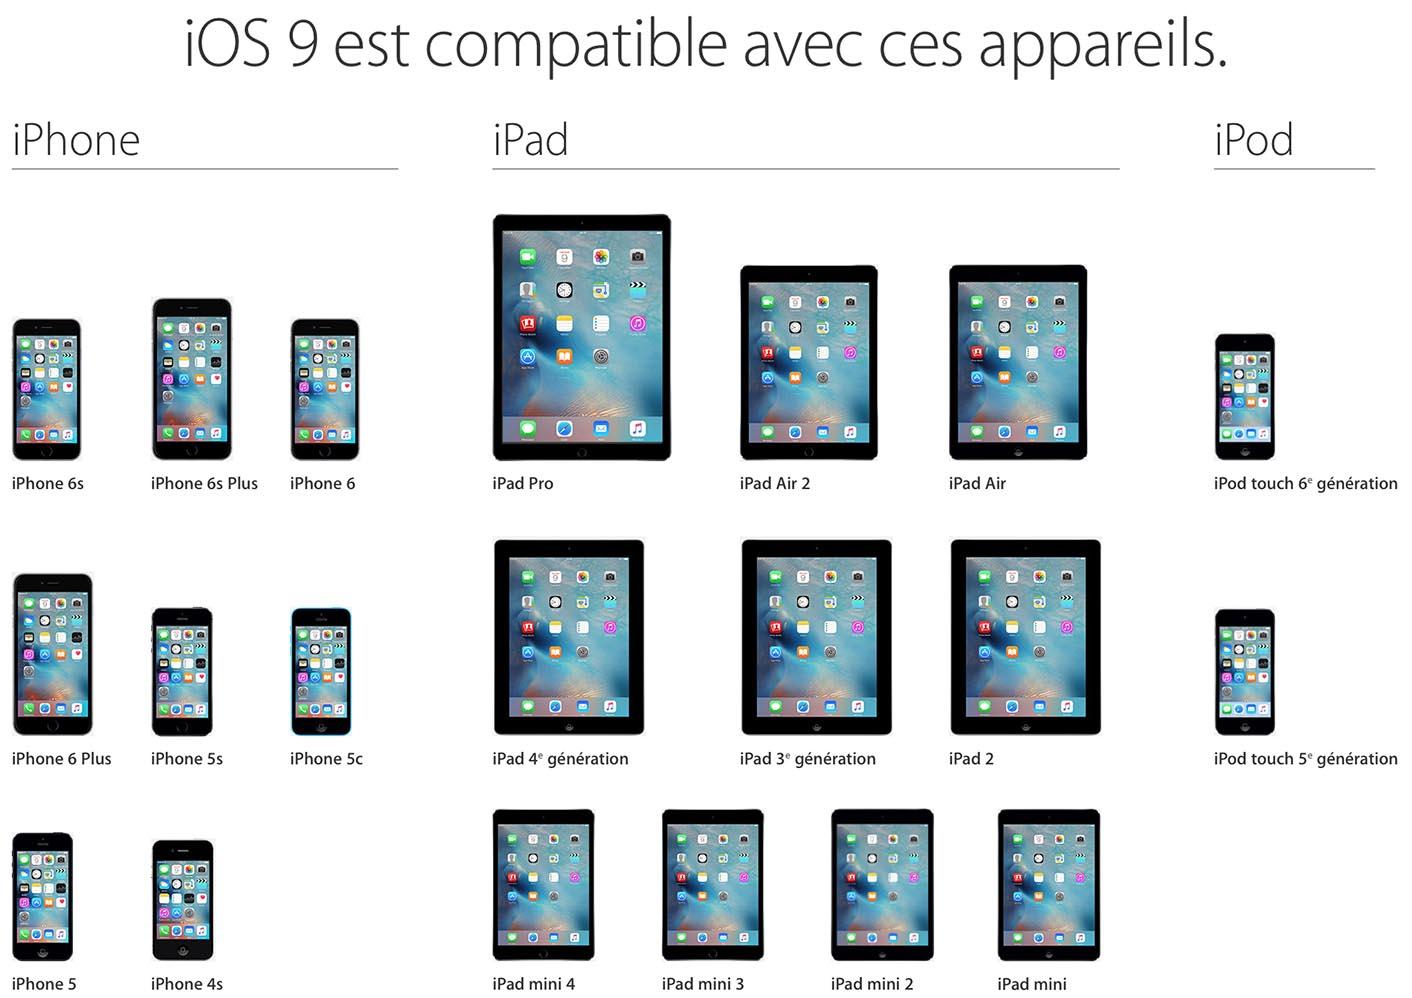 iOS 9 appareils compatibles